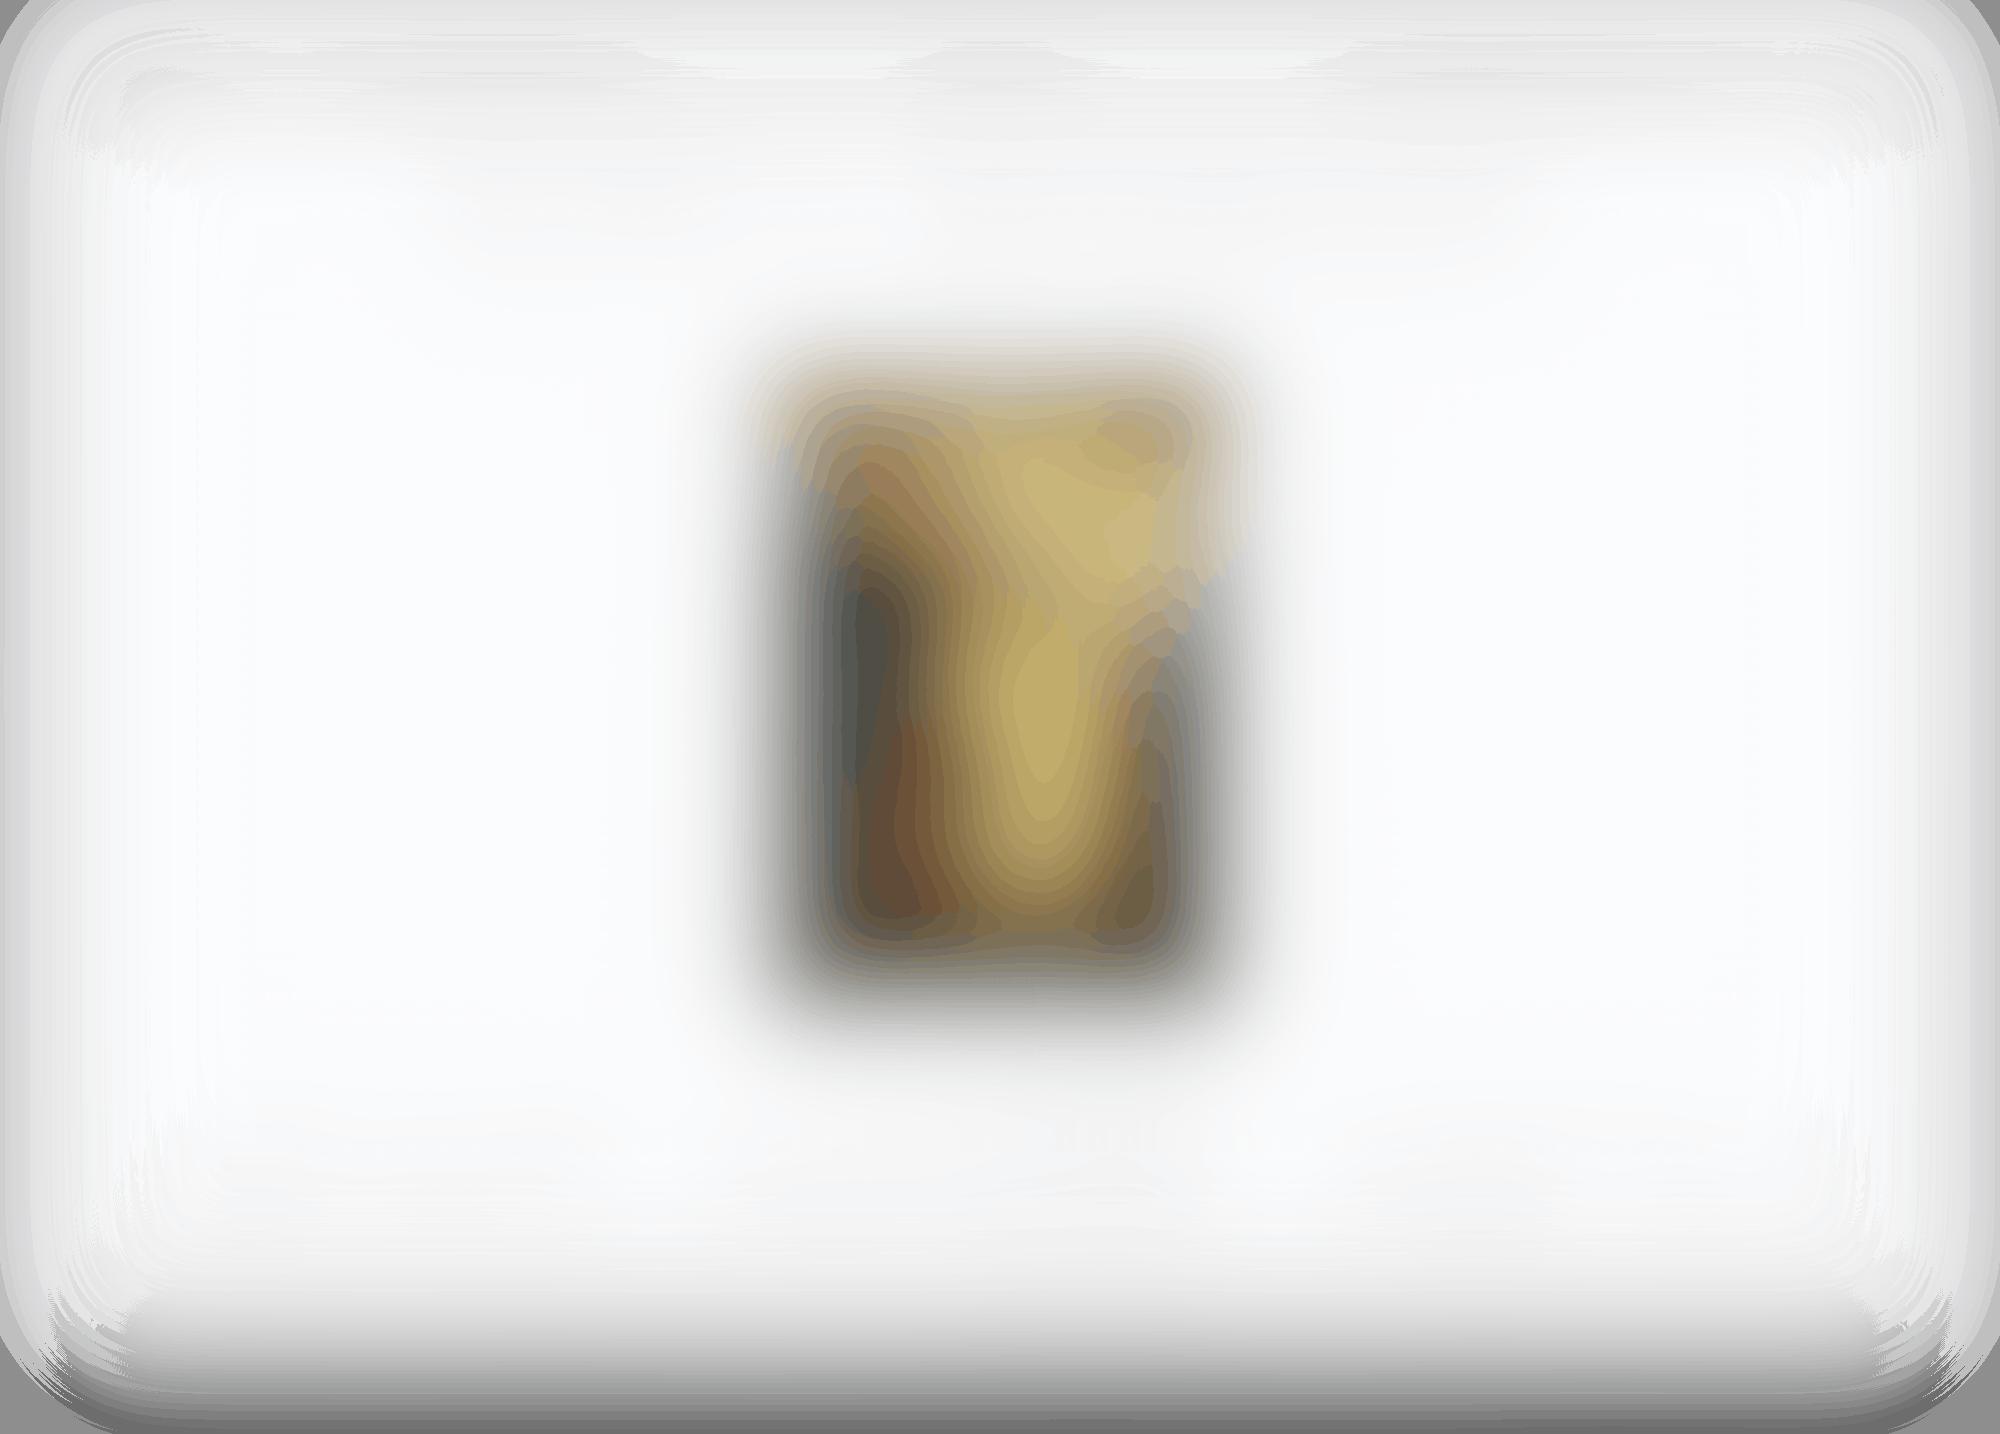 Katy Barker autocompressfitresizeixlibphp 1 1 0max h2000max w3 D2000q80sf3538aaf7945a580a6caf050160b6463